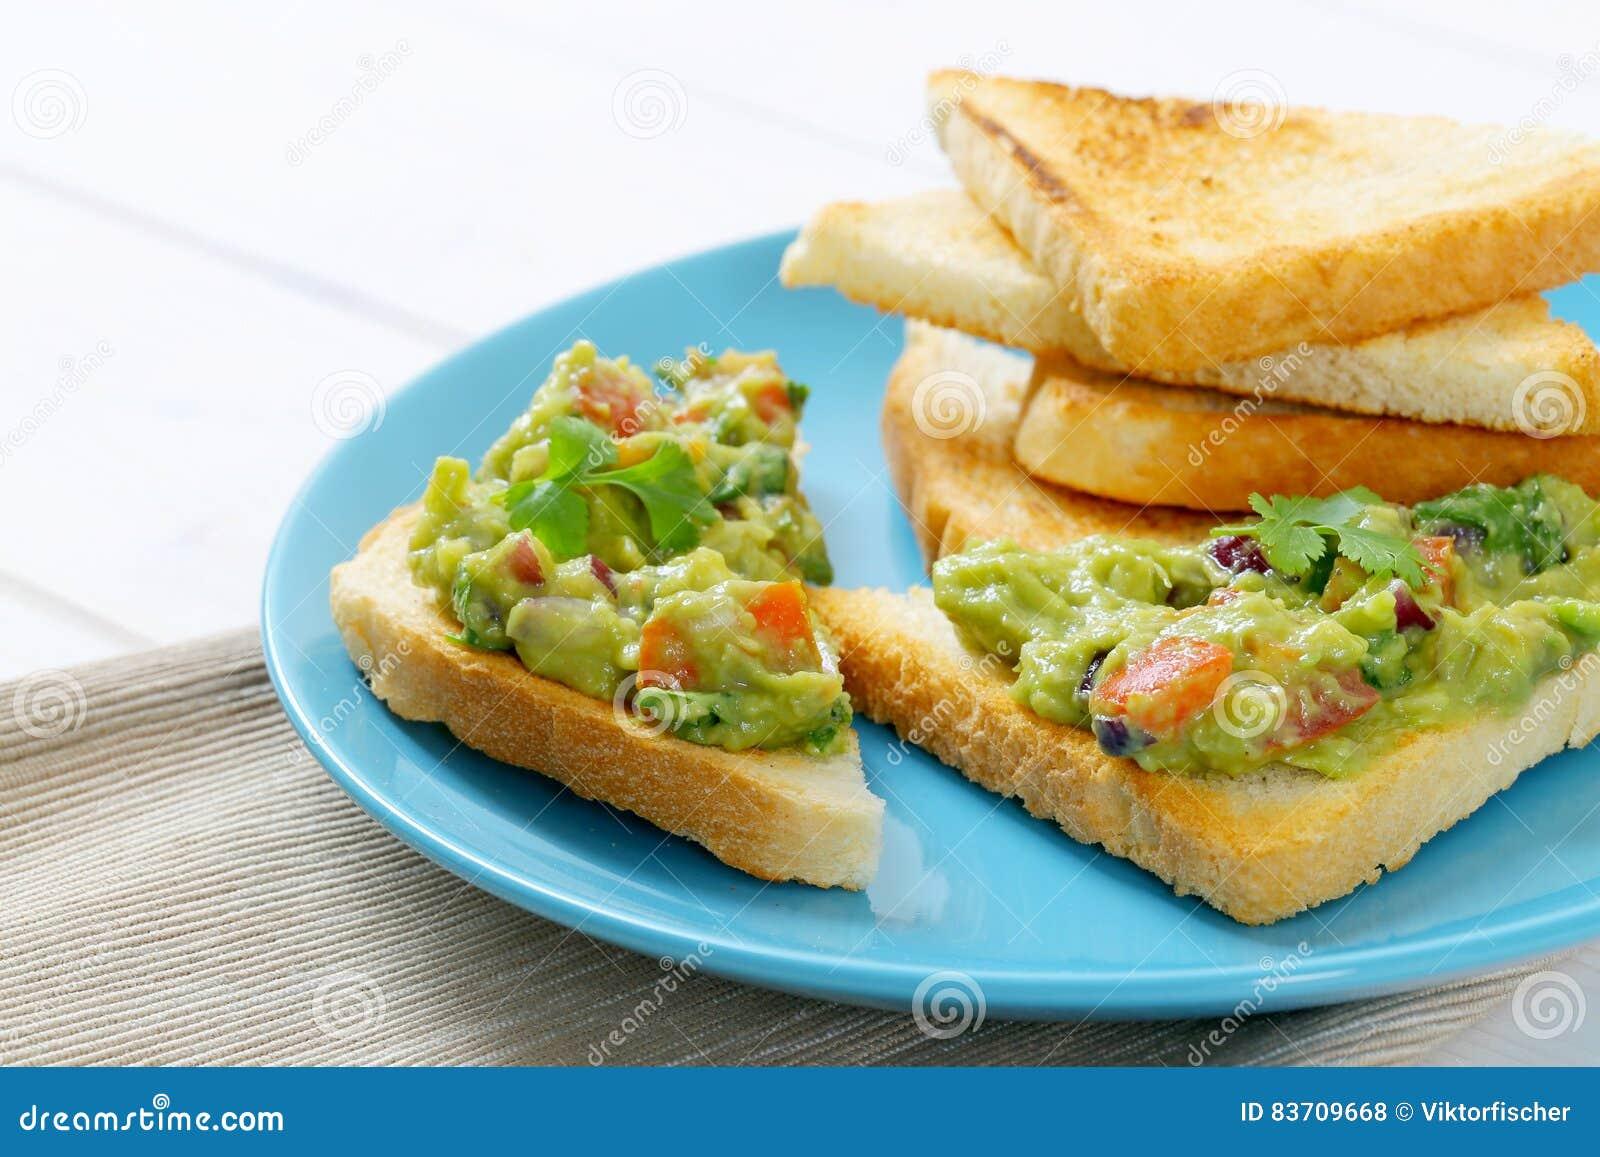 Toast Bread With Guacamole Stock Photo